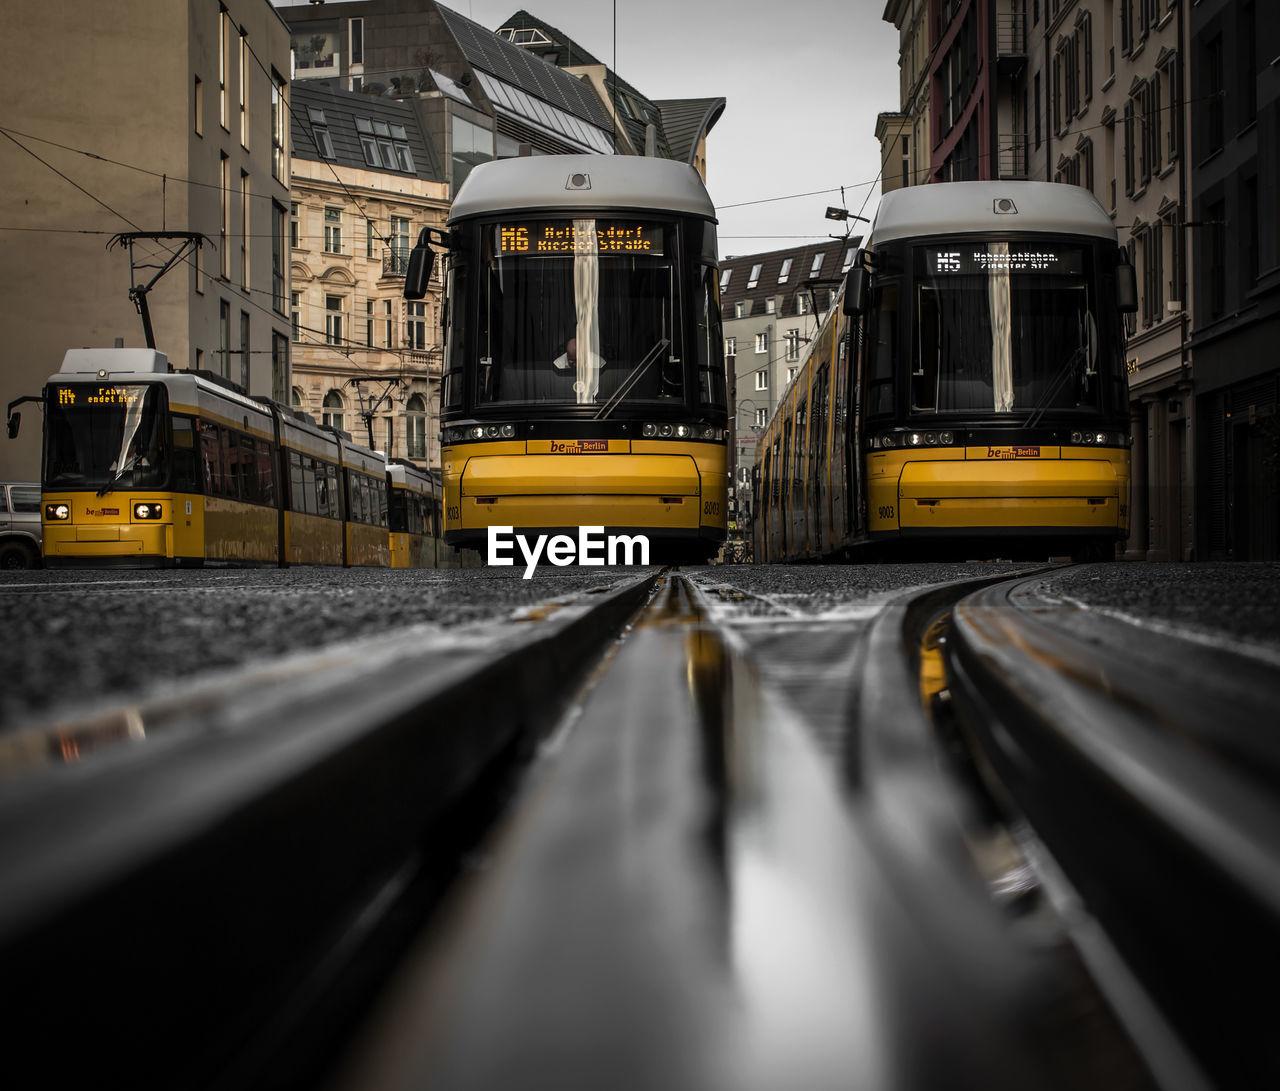 VIEW OF TRAIN AT RAILROAD TRACKS